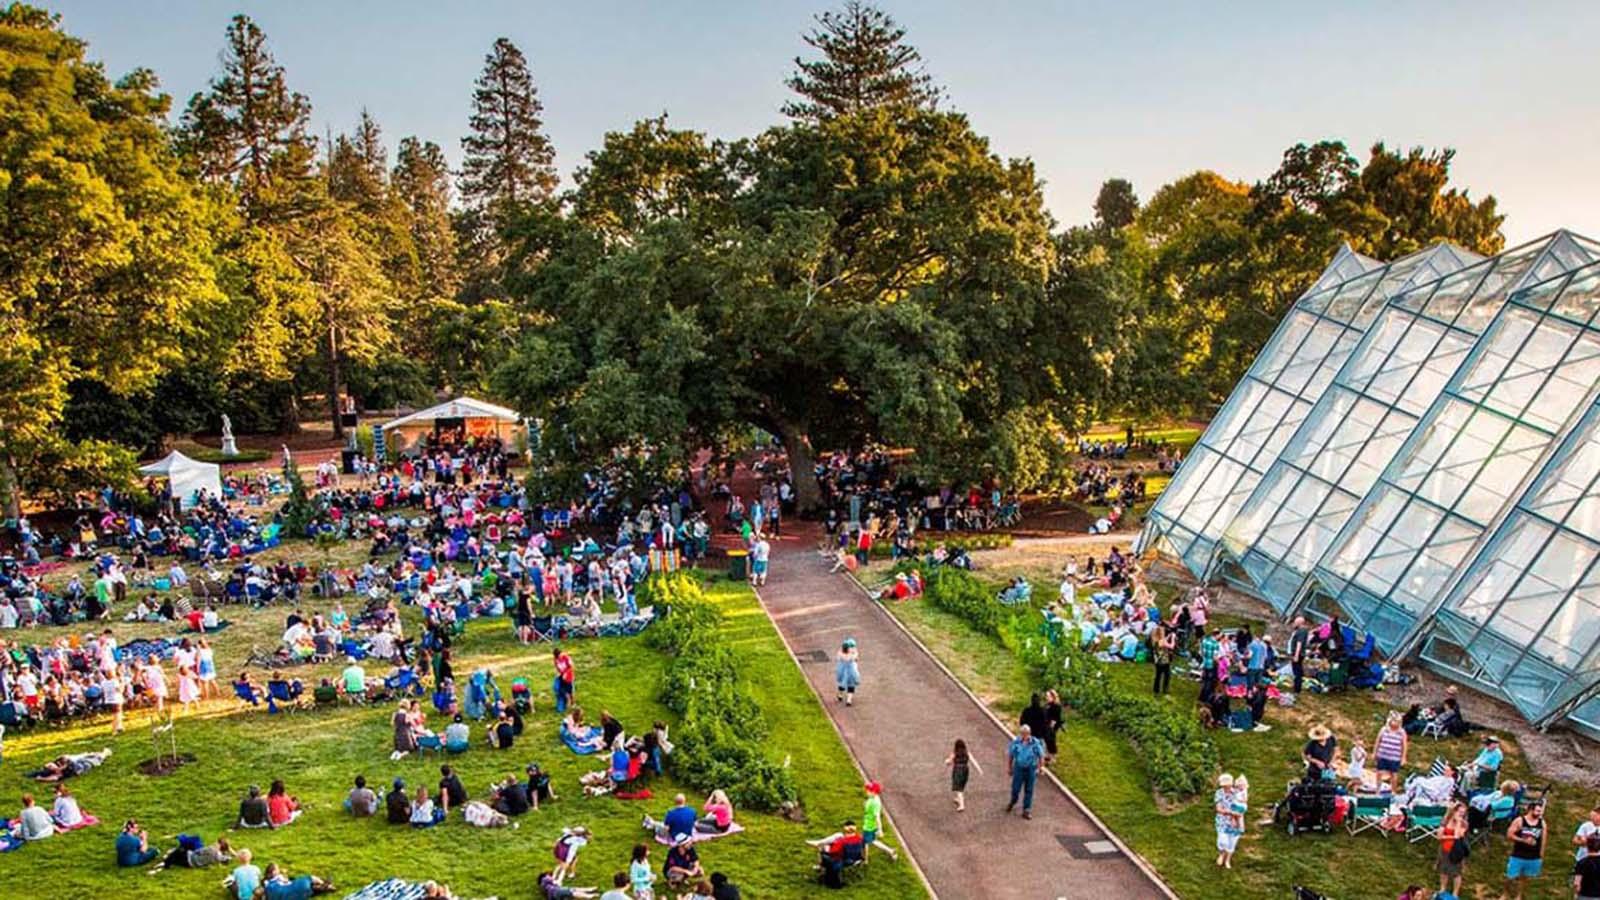 Ballarat Botanical Gardens events, Goldfields, Victoria, Australia